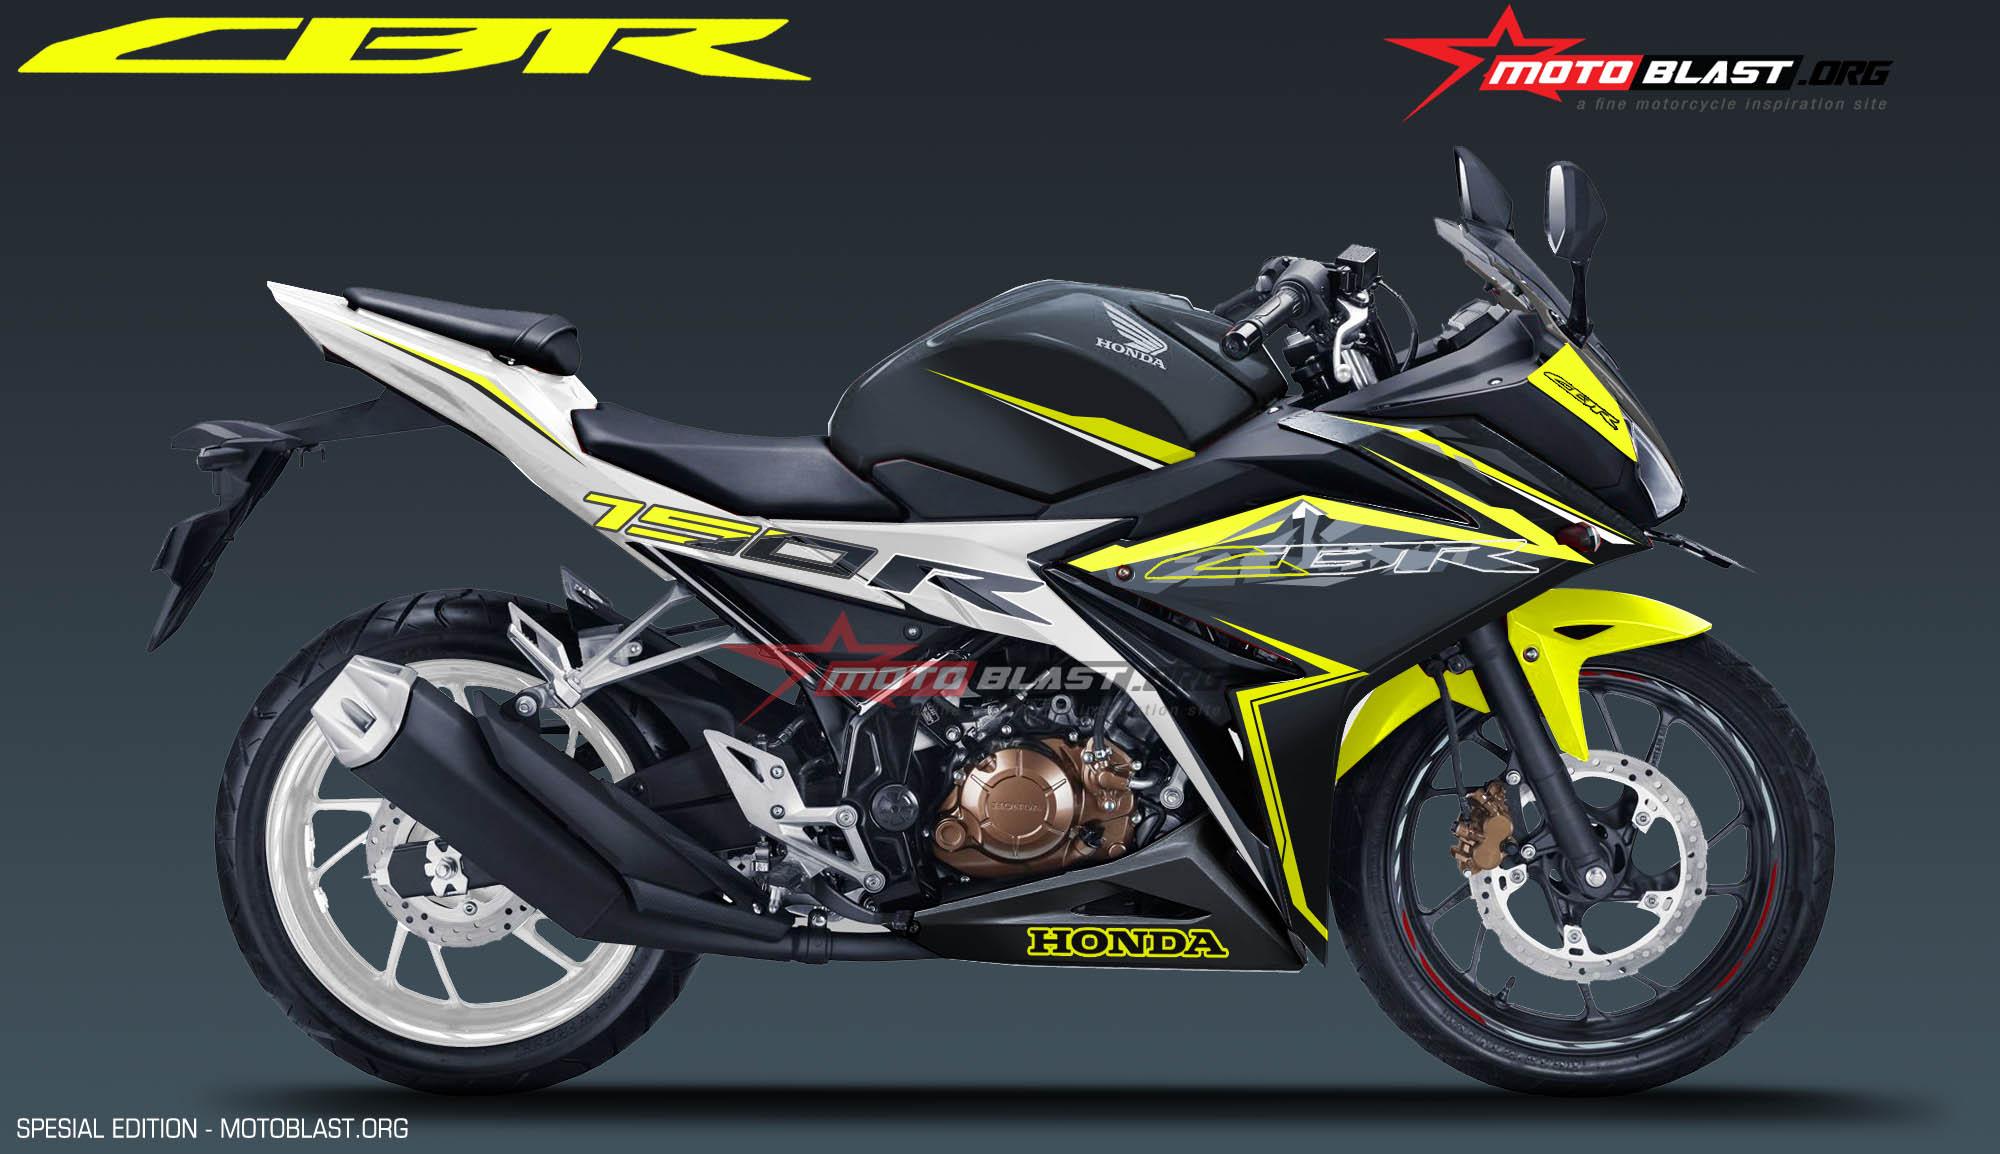 Modifikasi Cbr 150 R Modif Honda Cbr 150 Terbaru 2015 | Motorcycle ...